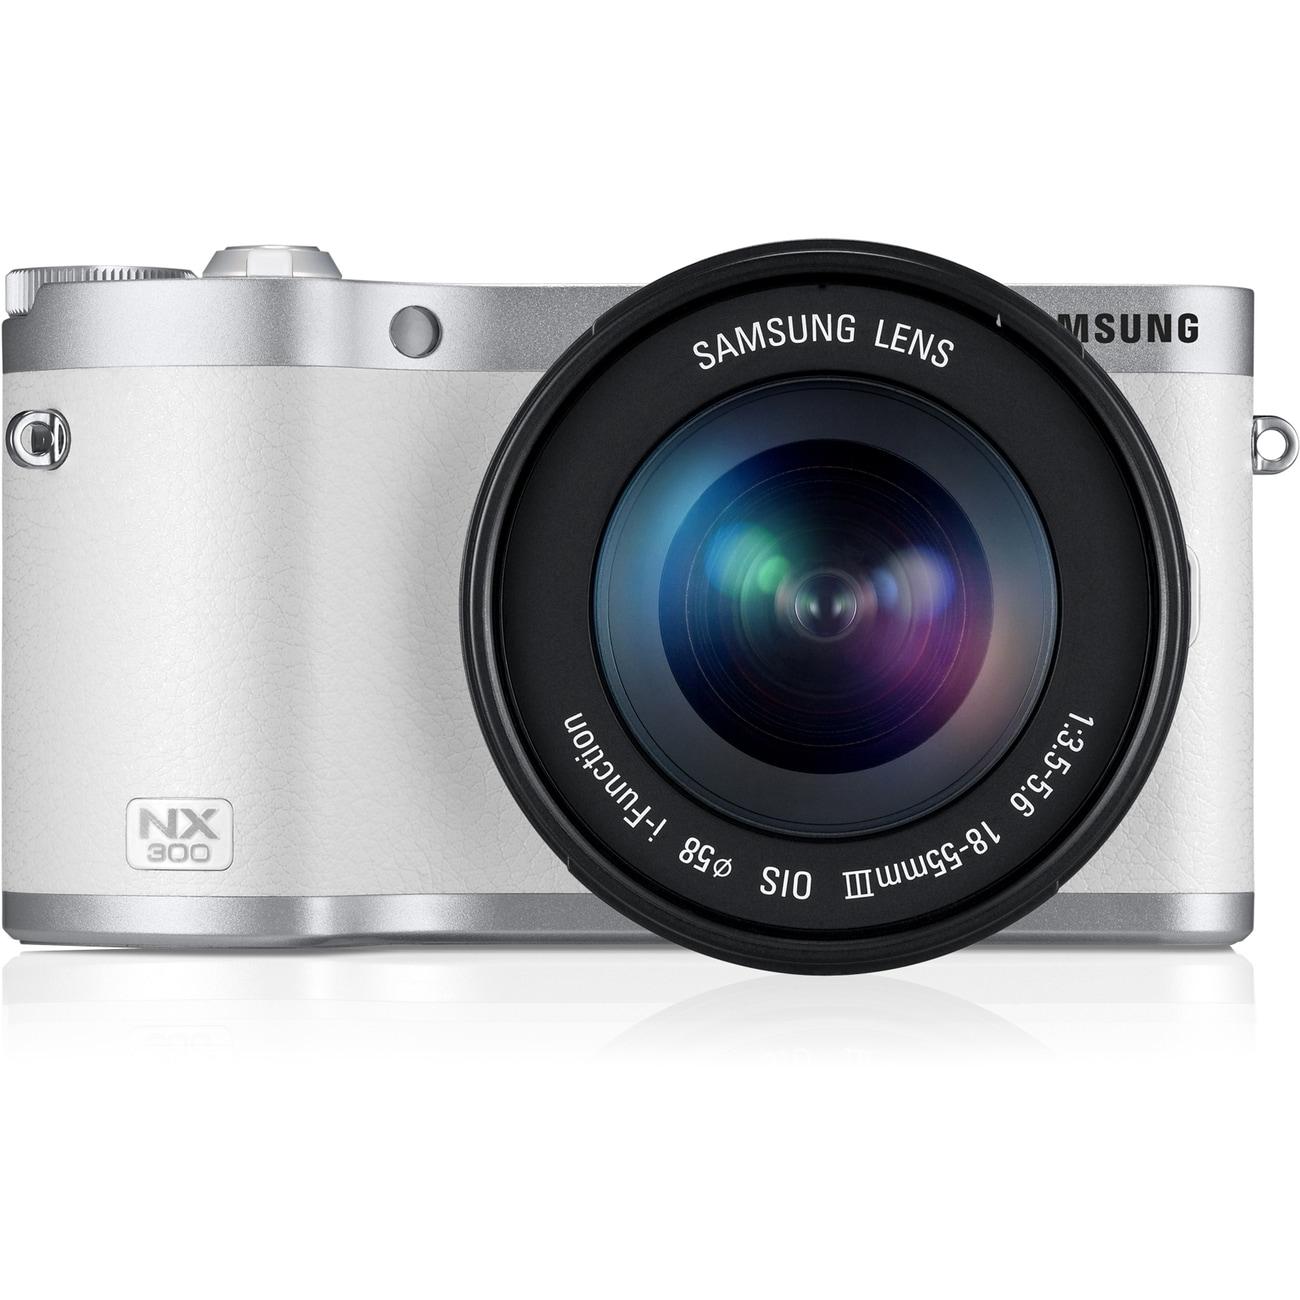 Samsung NX300 20.3MP White Mirrorless Digital Camera with...